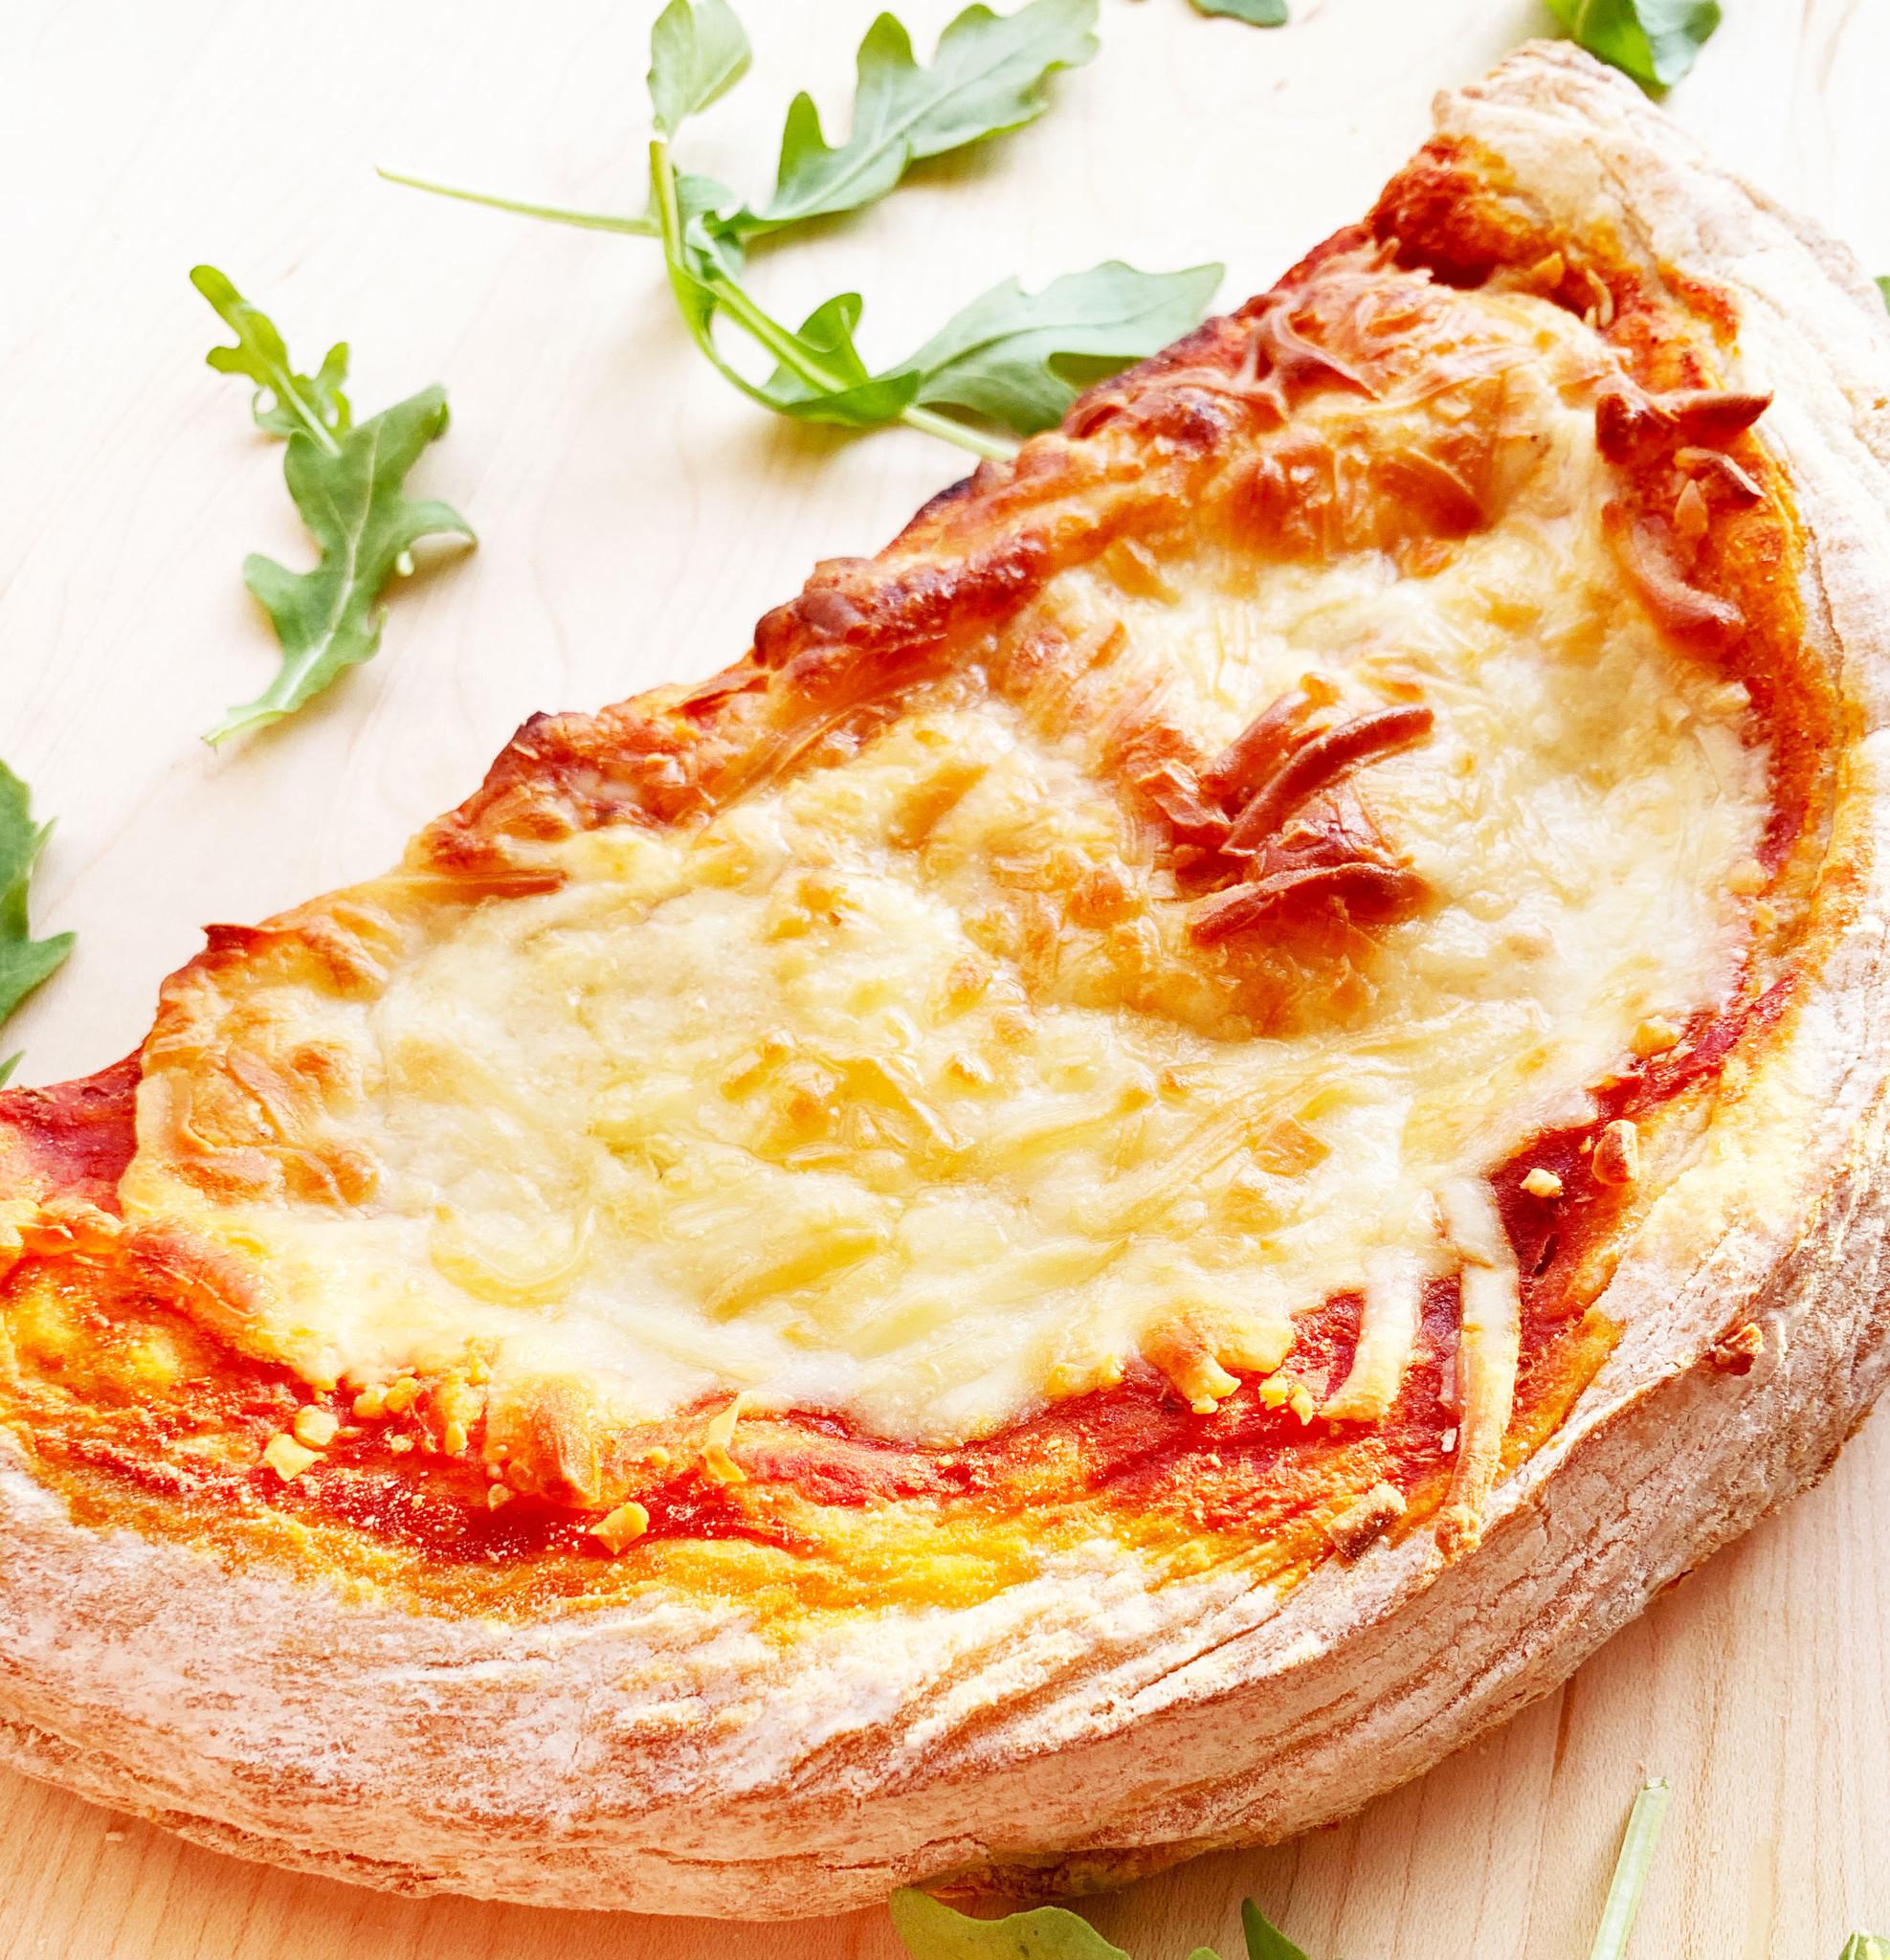 Vegan pizza & artisan crust